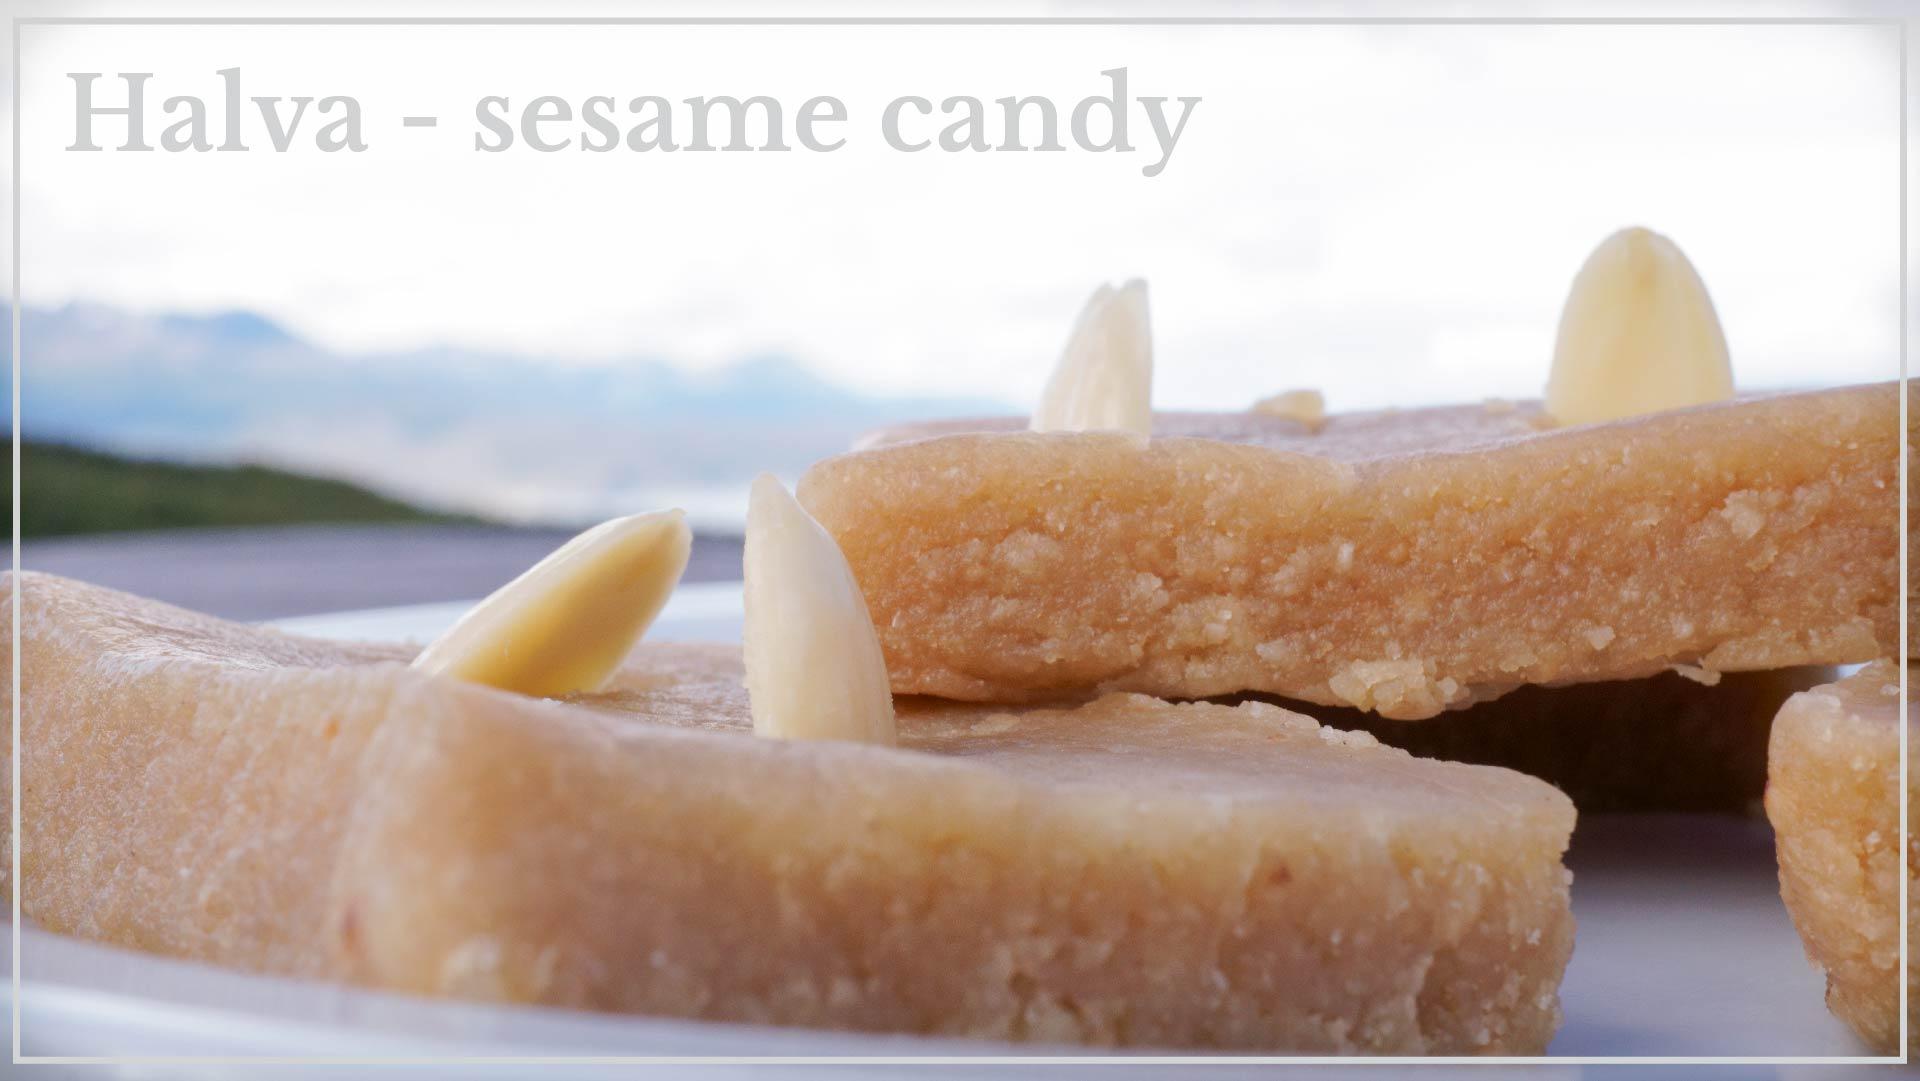 Halva - sesame and honey bar candy